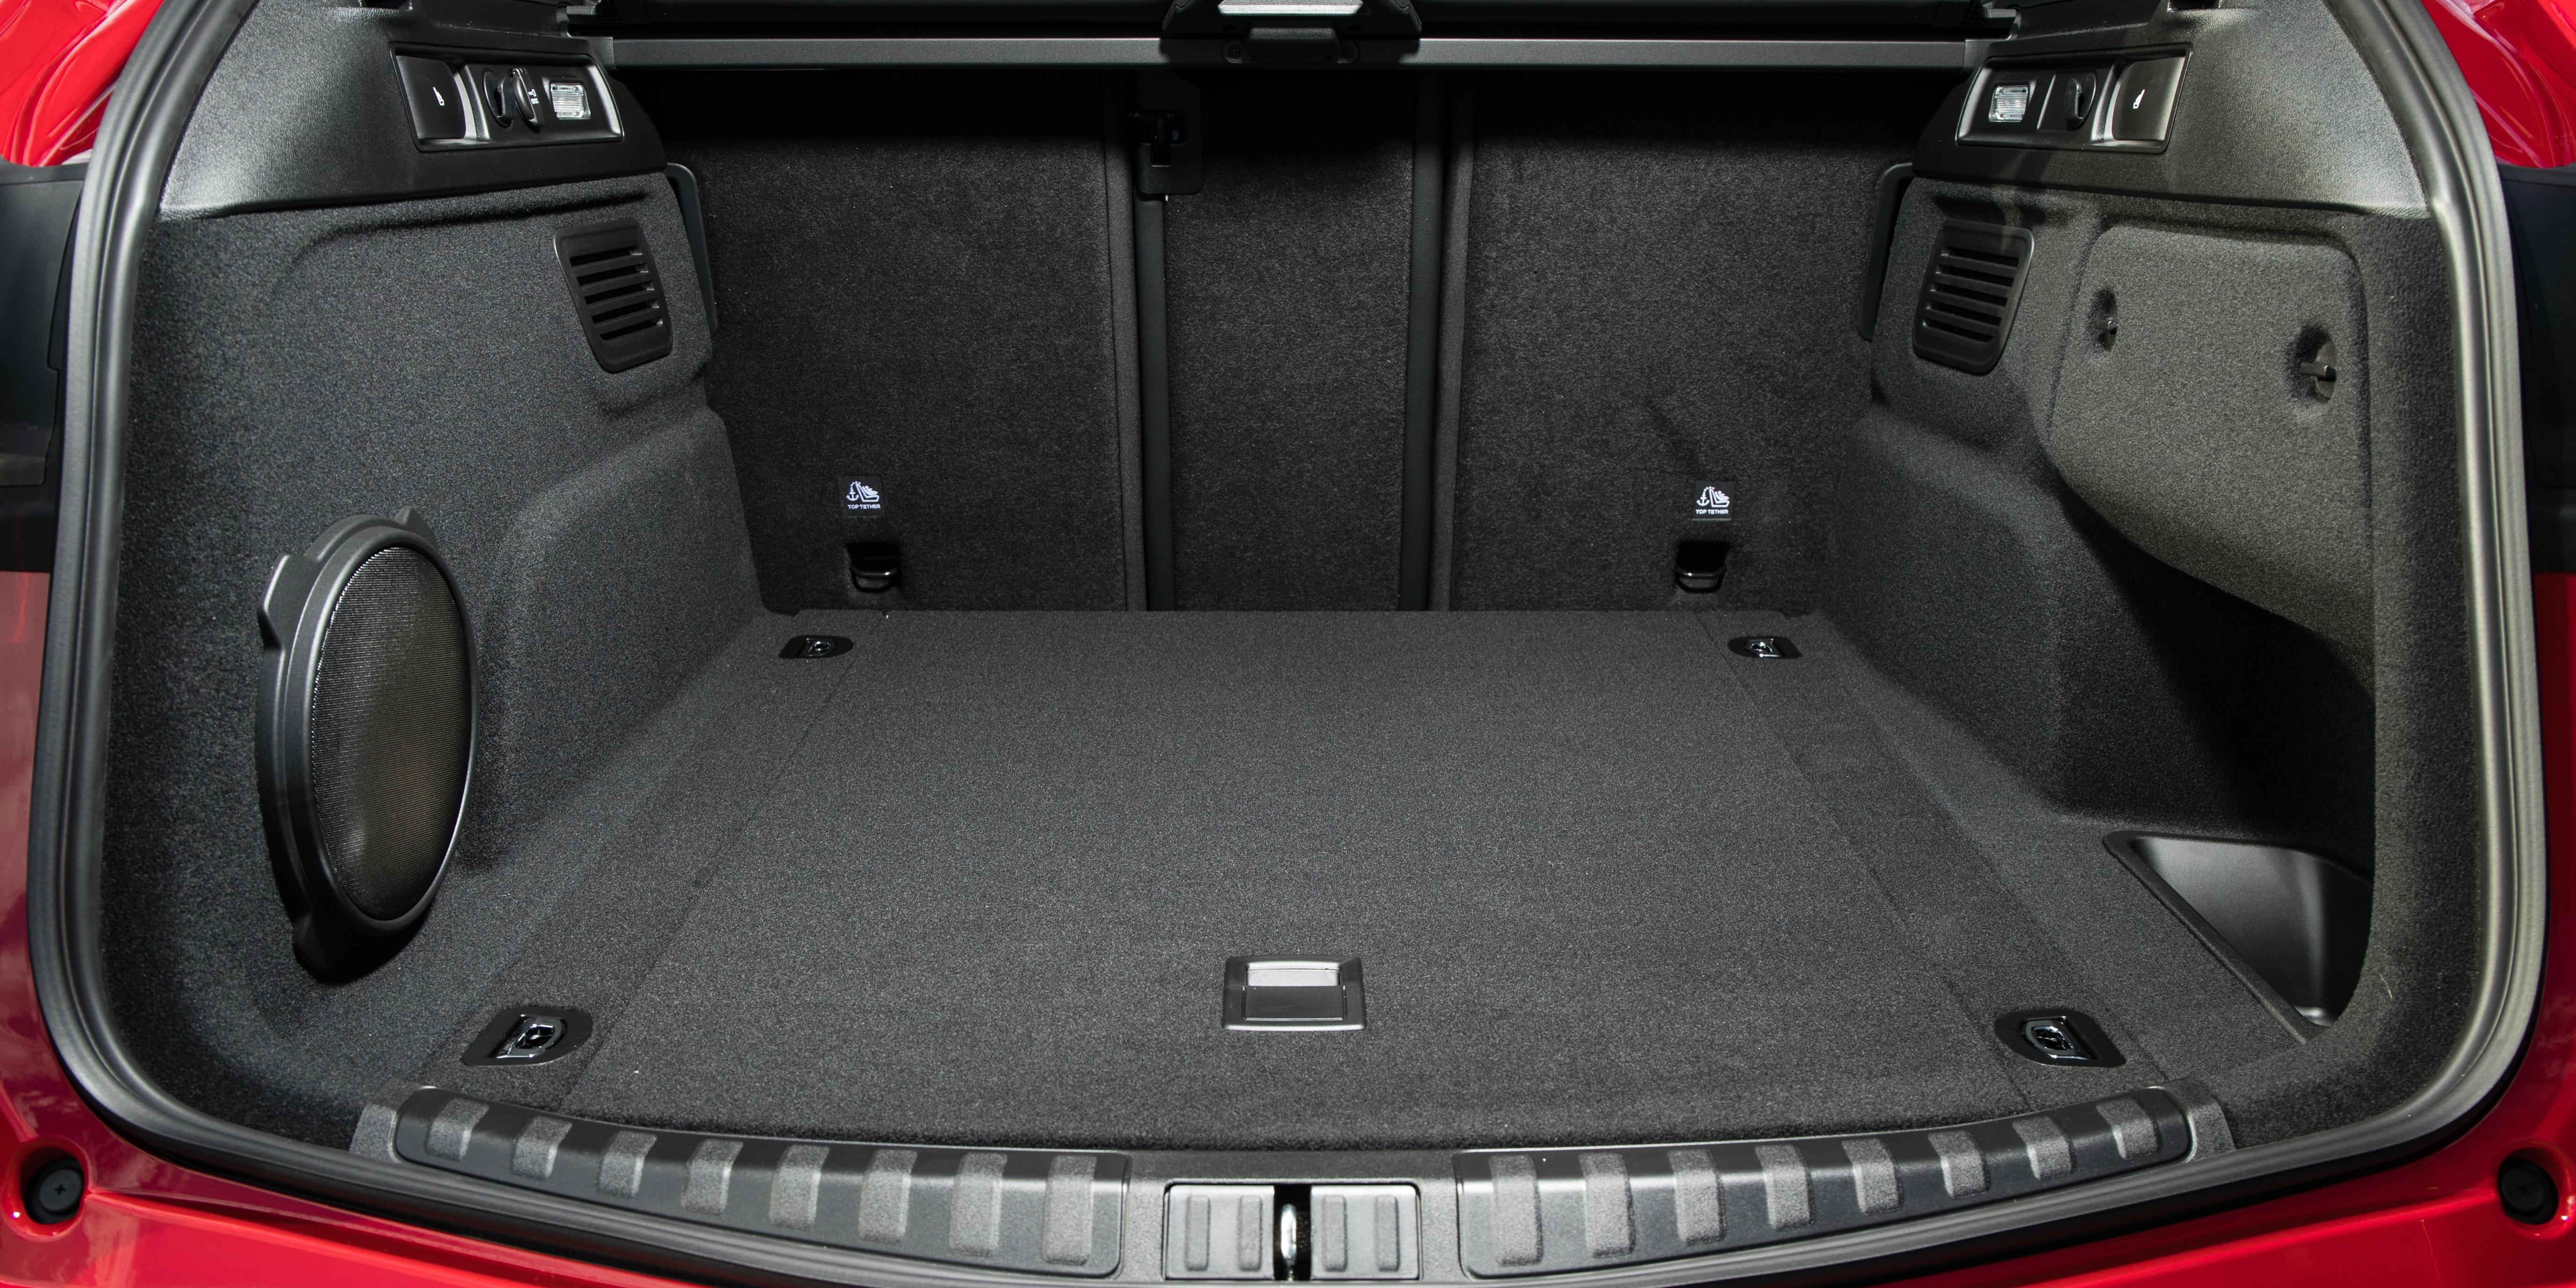 8 Seat Suv >> Alfa Romeo Stelvio Specifications | carwow